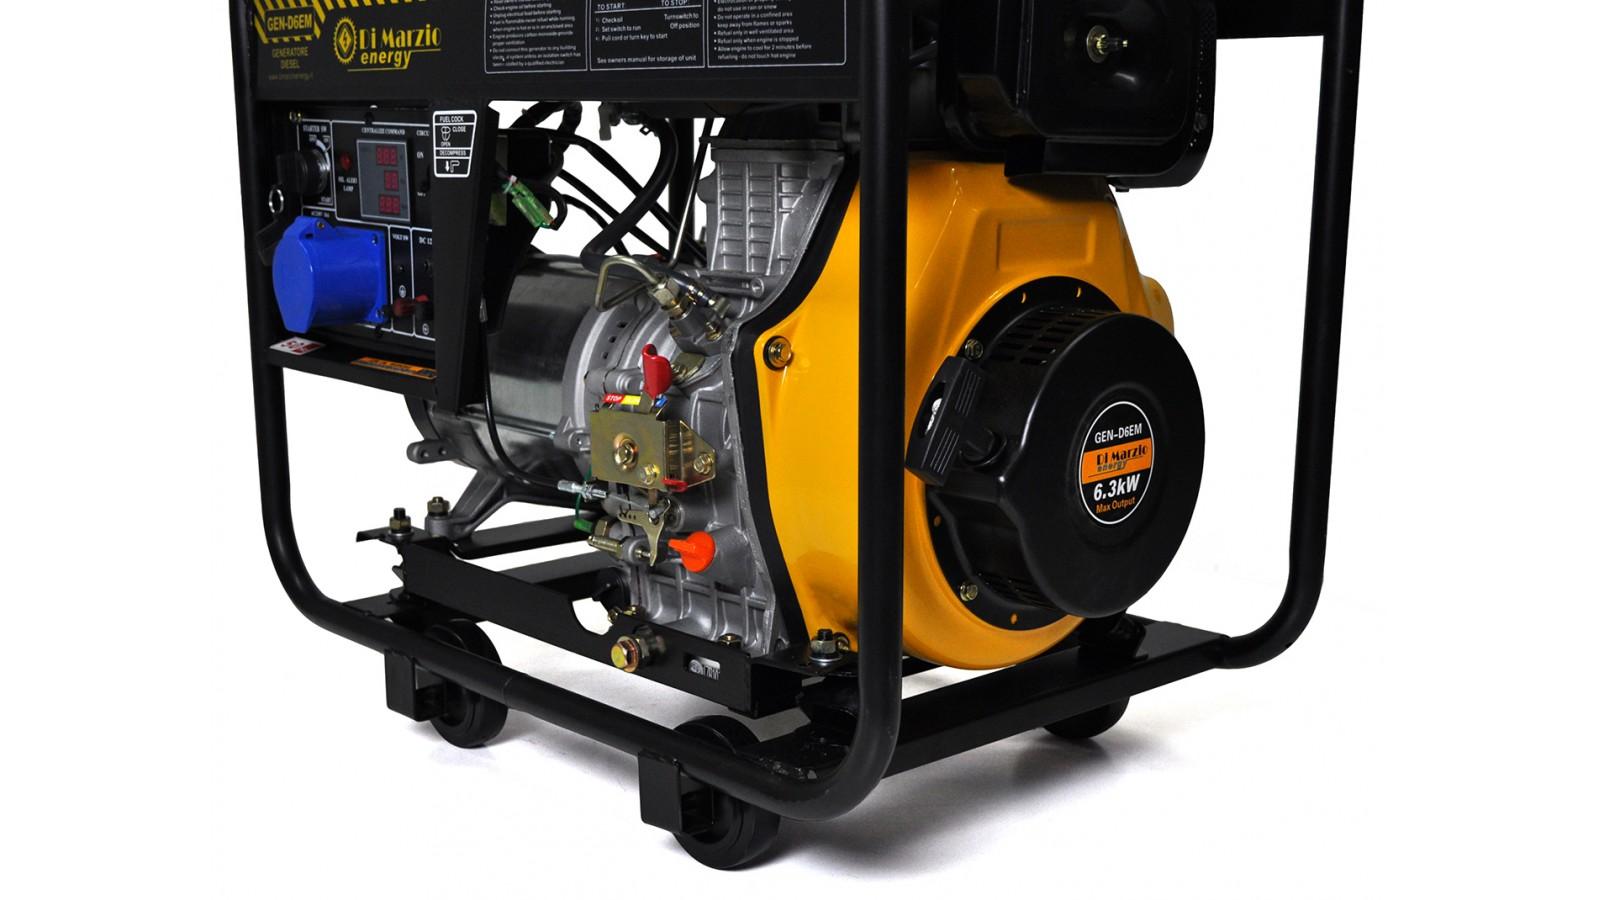 Generatore di corrente diesel 6 kw gruppo elettrogeno for Generatore di corrente 10 kw